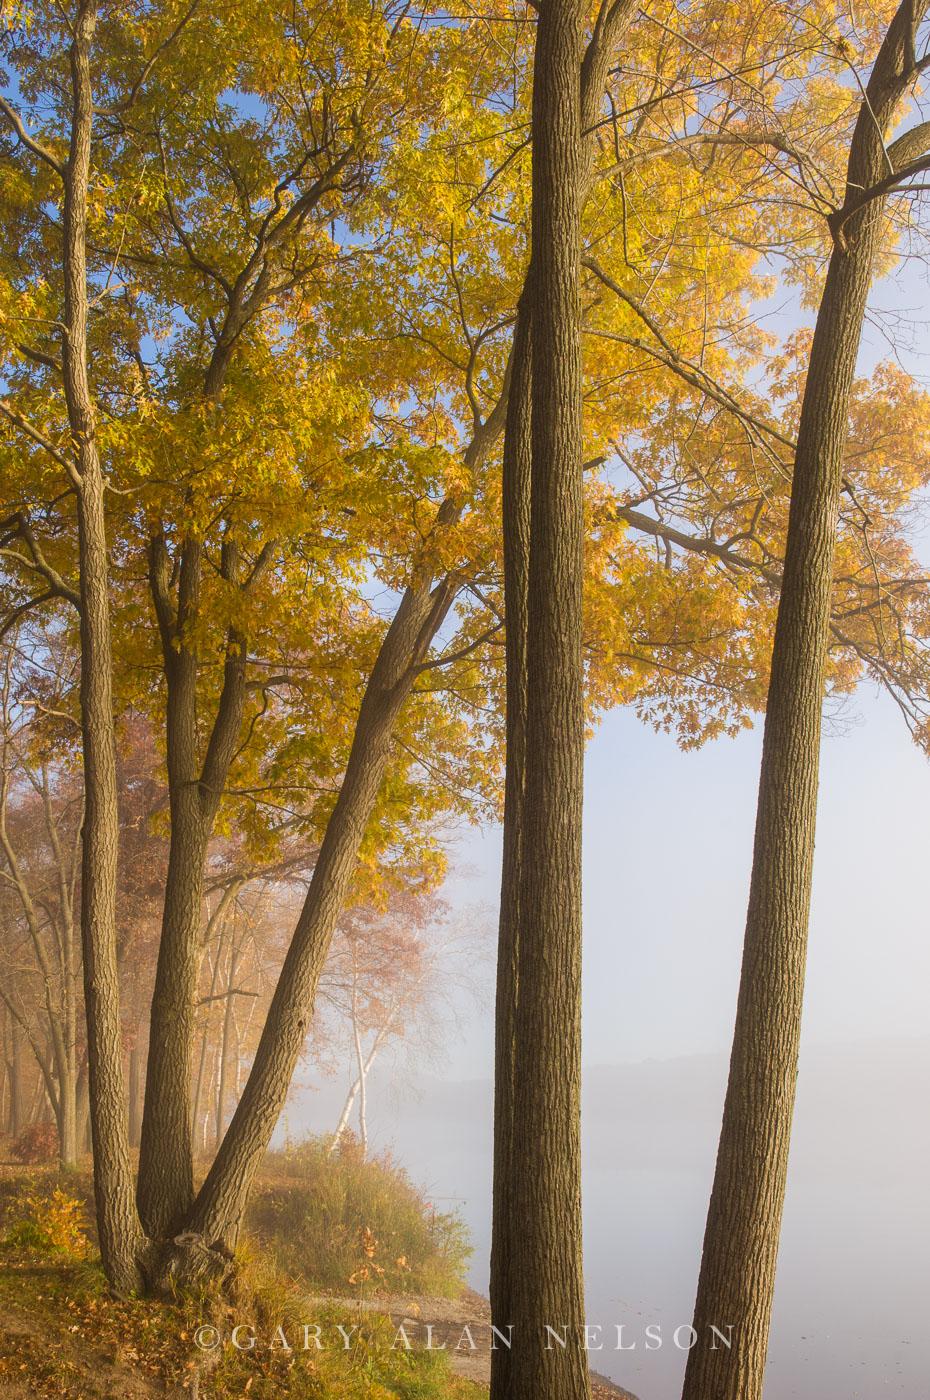 St. croix river, minnesota, wisconsin, fog, interstate state park, photo